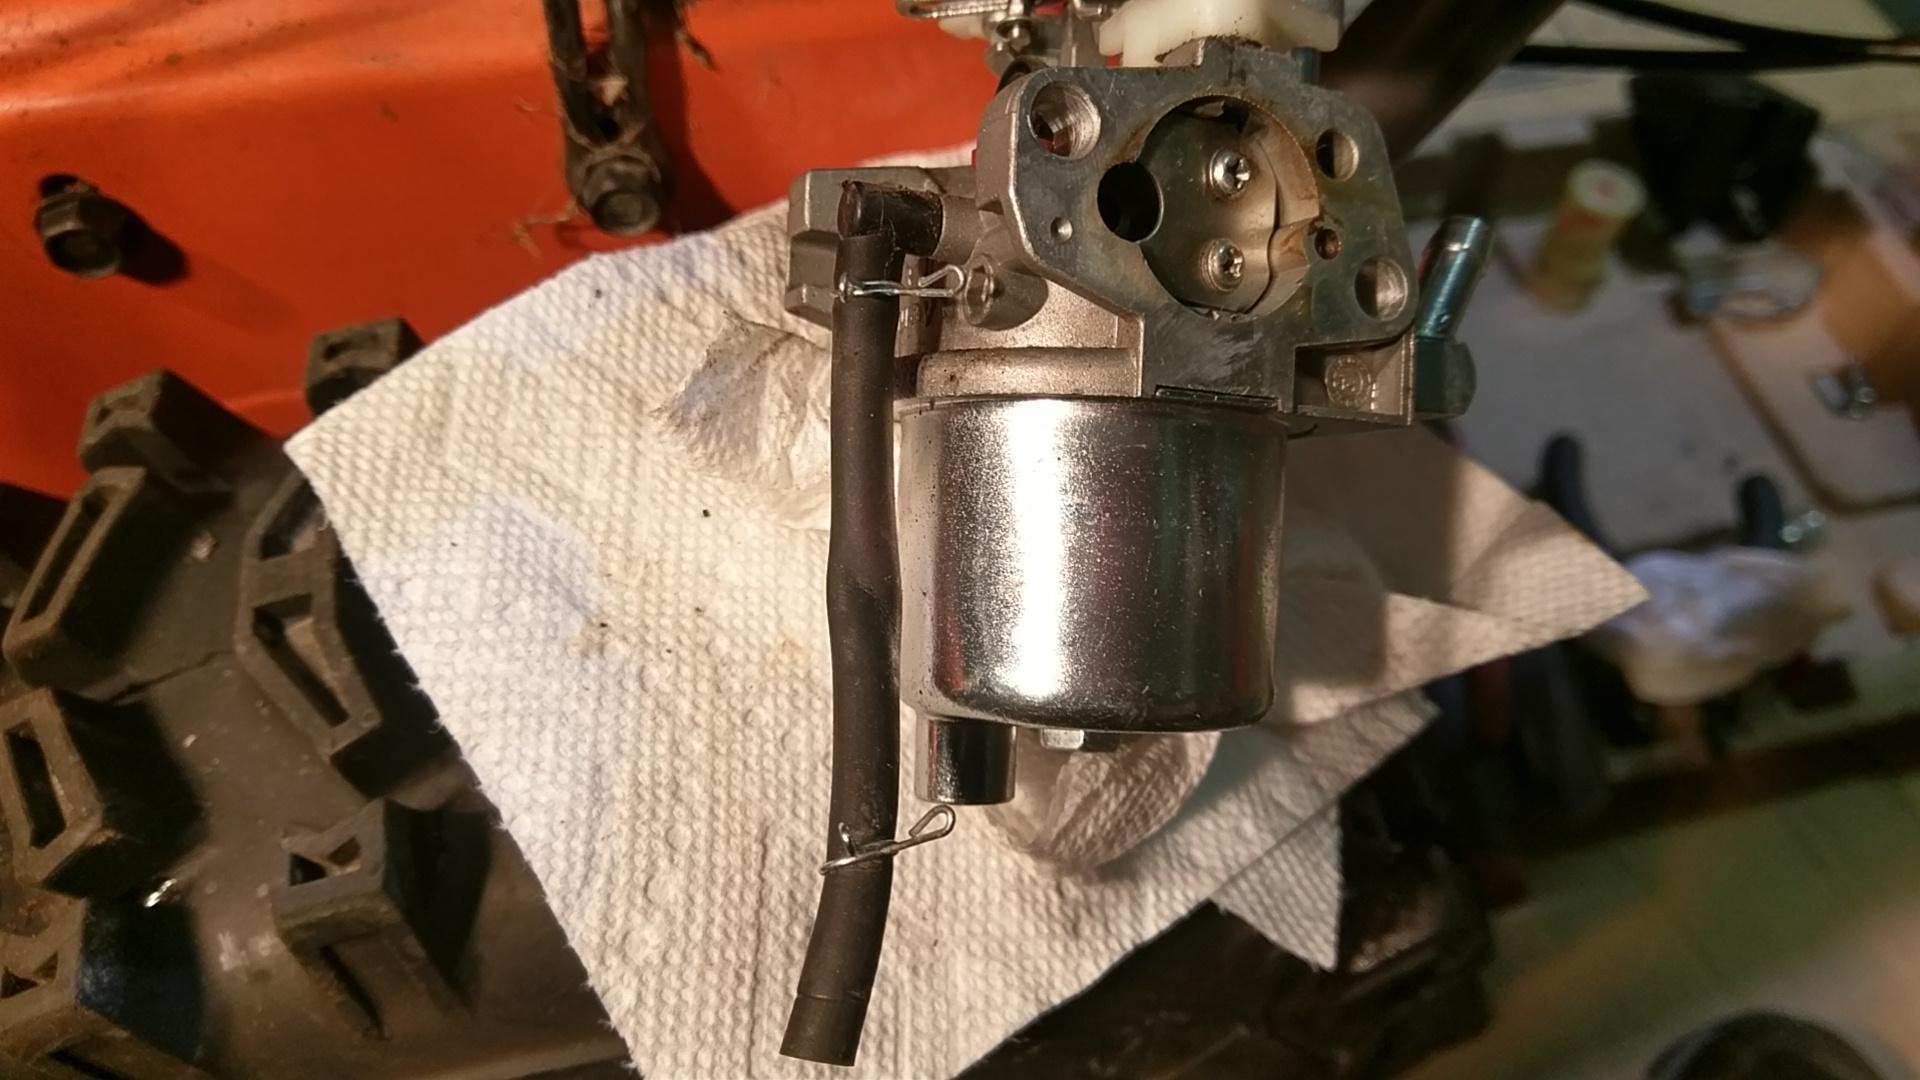 Cleaned Carburetor Using Berrymans's B12 Still  No Start - Husqvarna Huayi Carburetor-imag1441.jpg